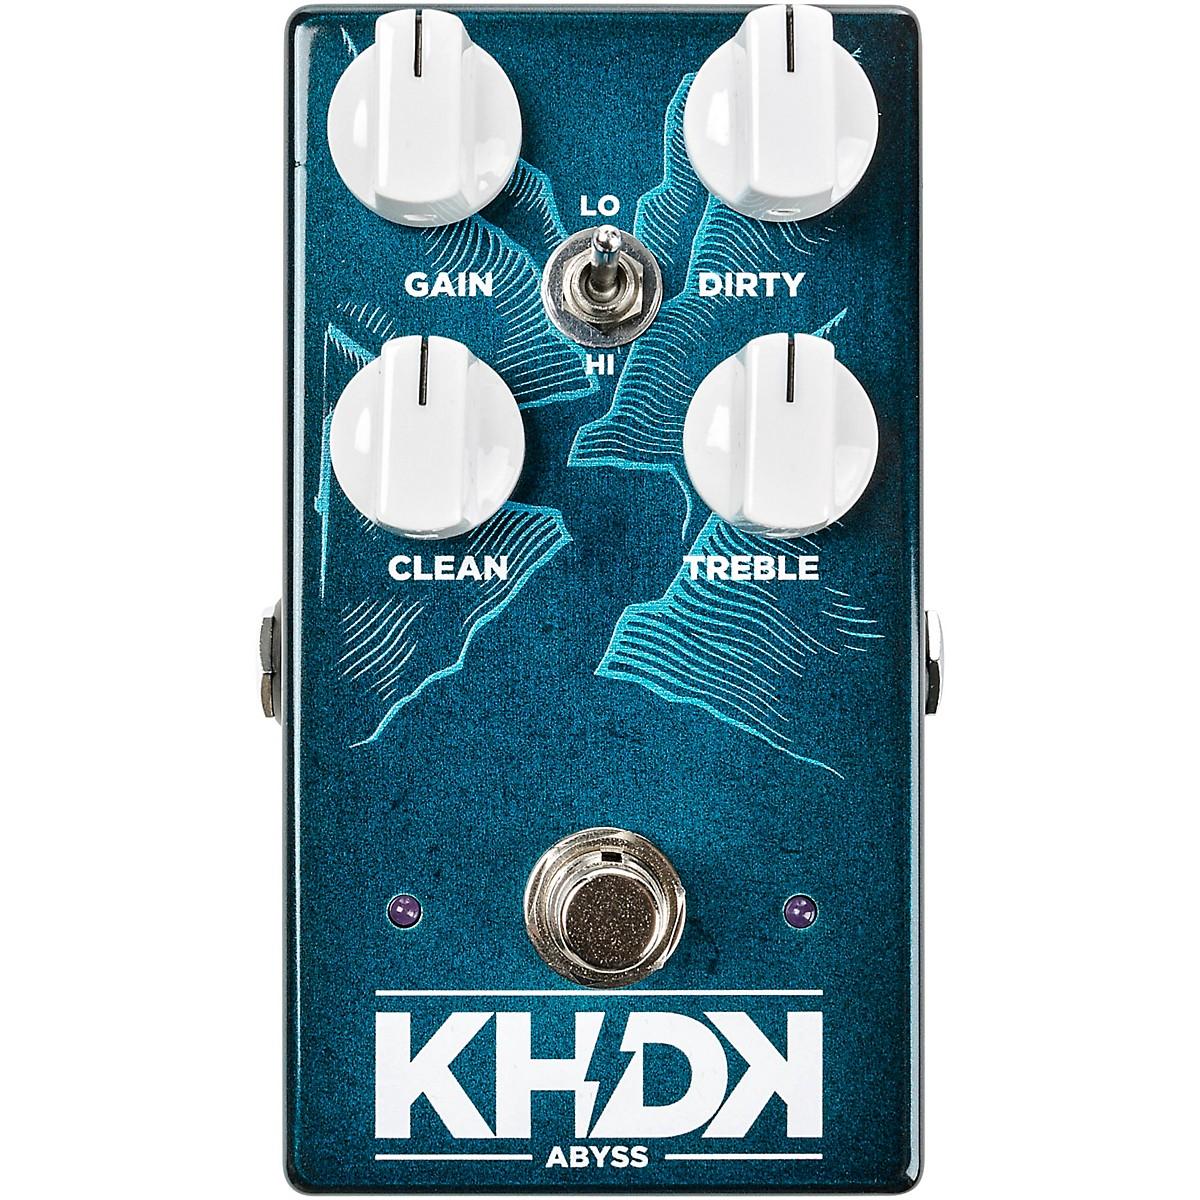 KHDK Abyss Bass Overdrive Effects Pedal